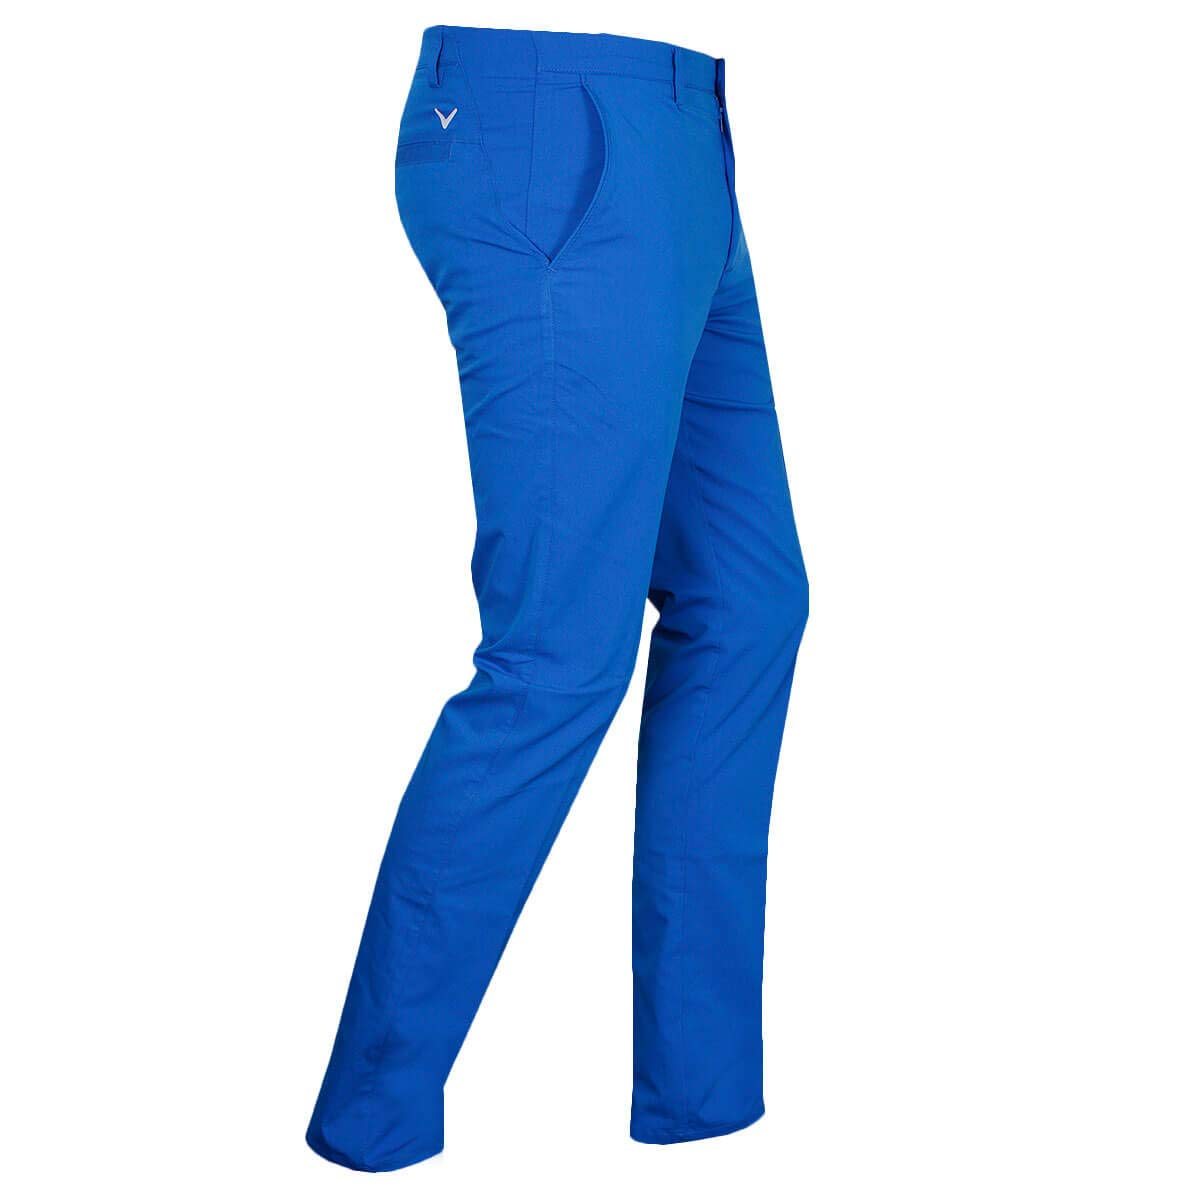 Callaway Cgbs90c0, Pantalon De Sport Homme, Bleu (bleu 472), Unique (Taille Fabricant  36)